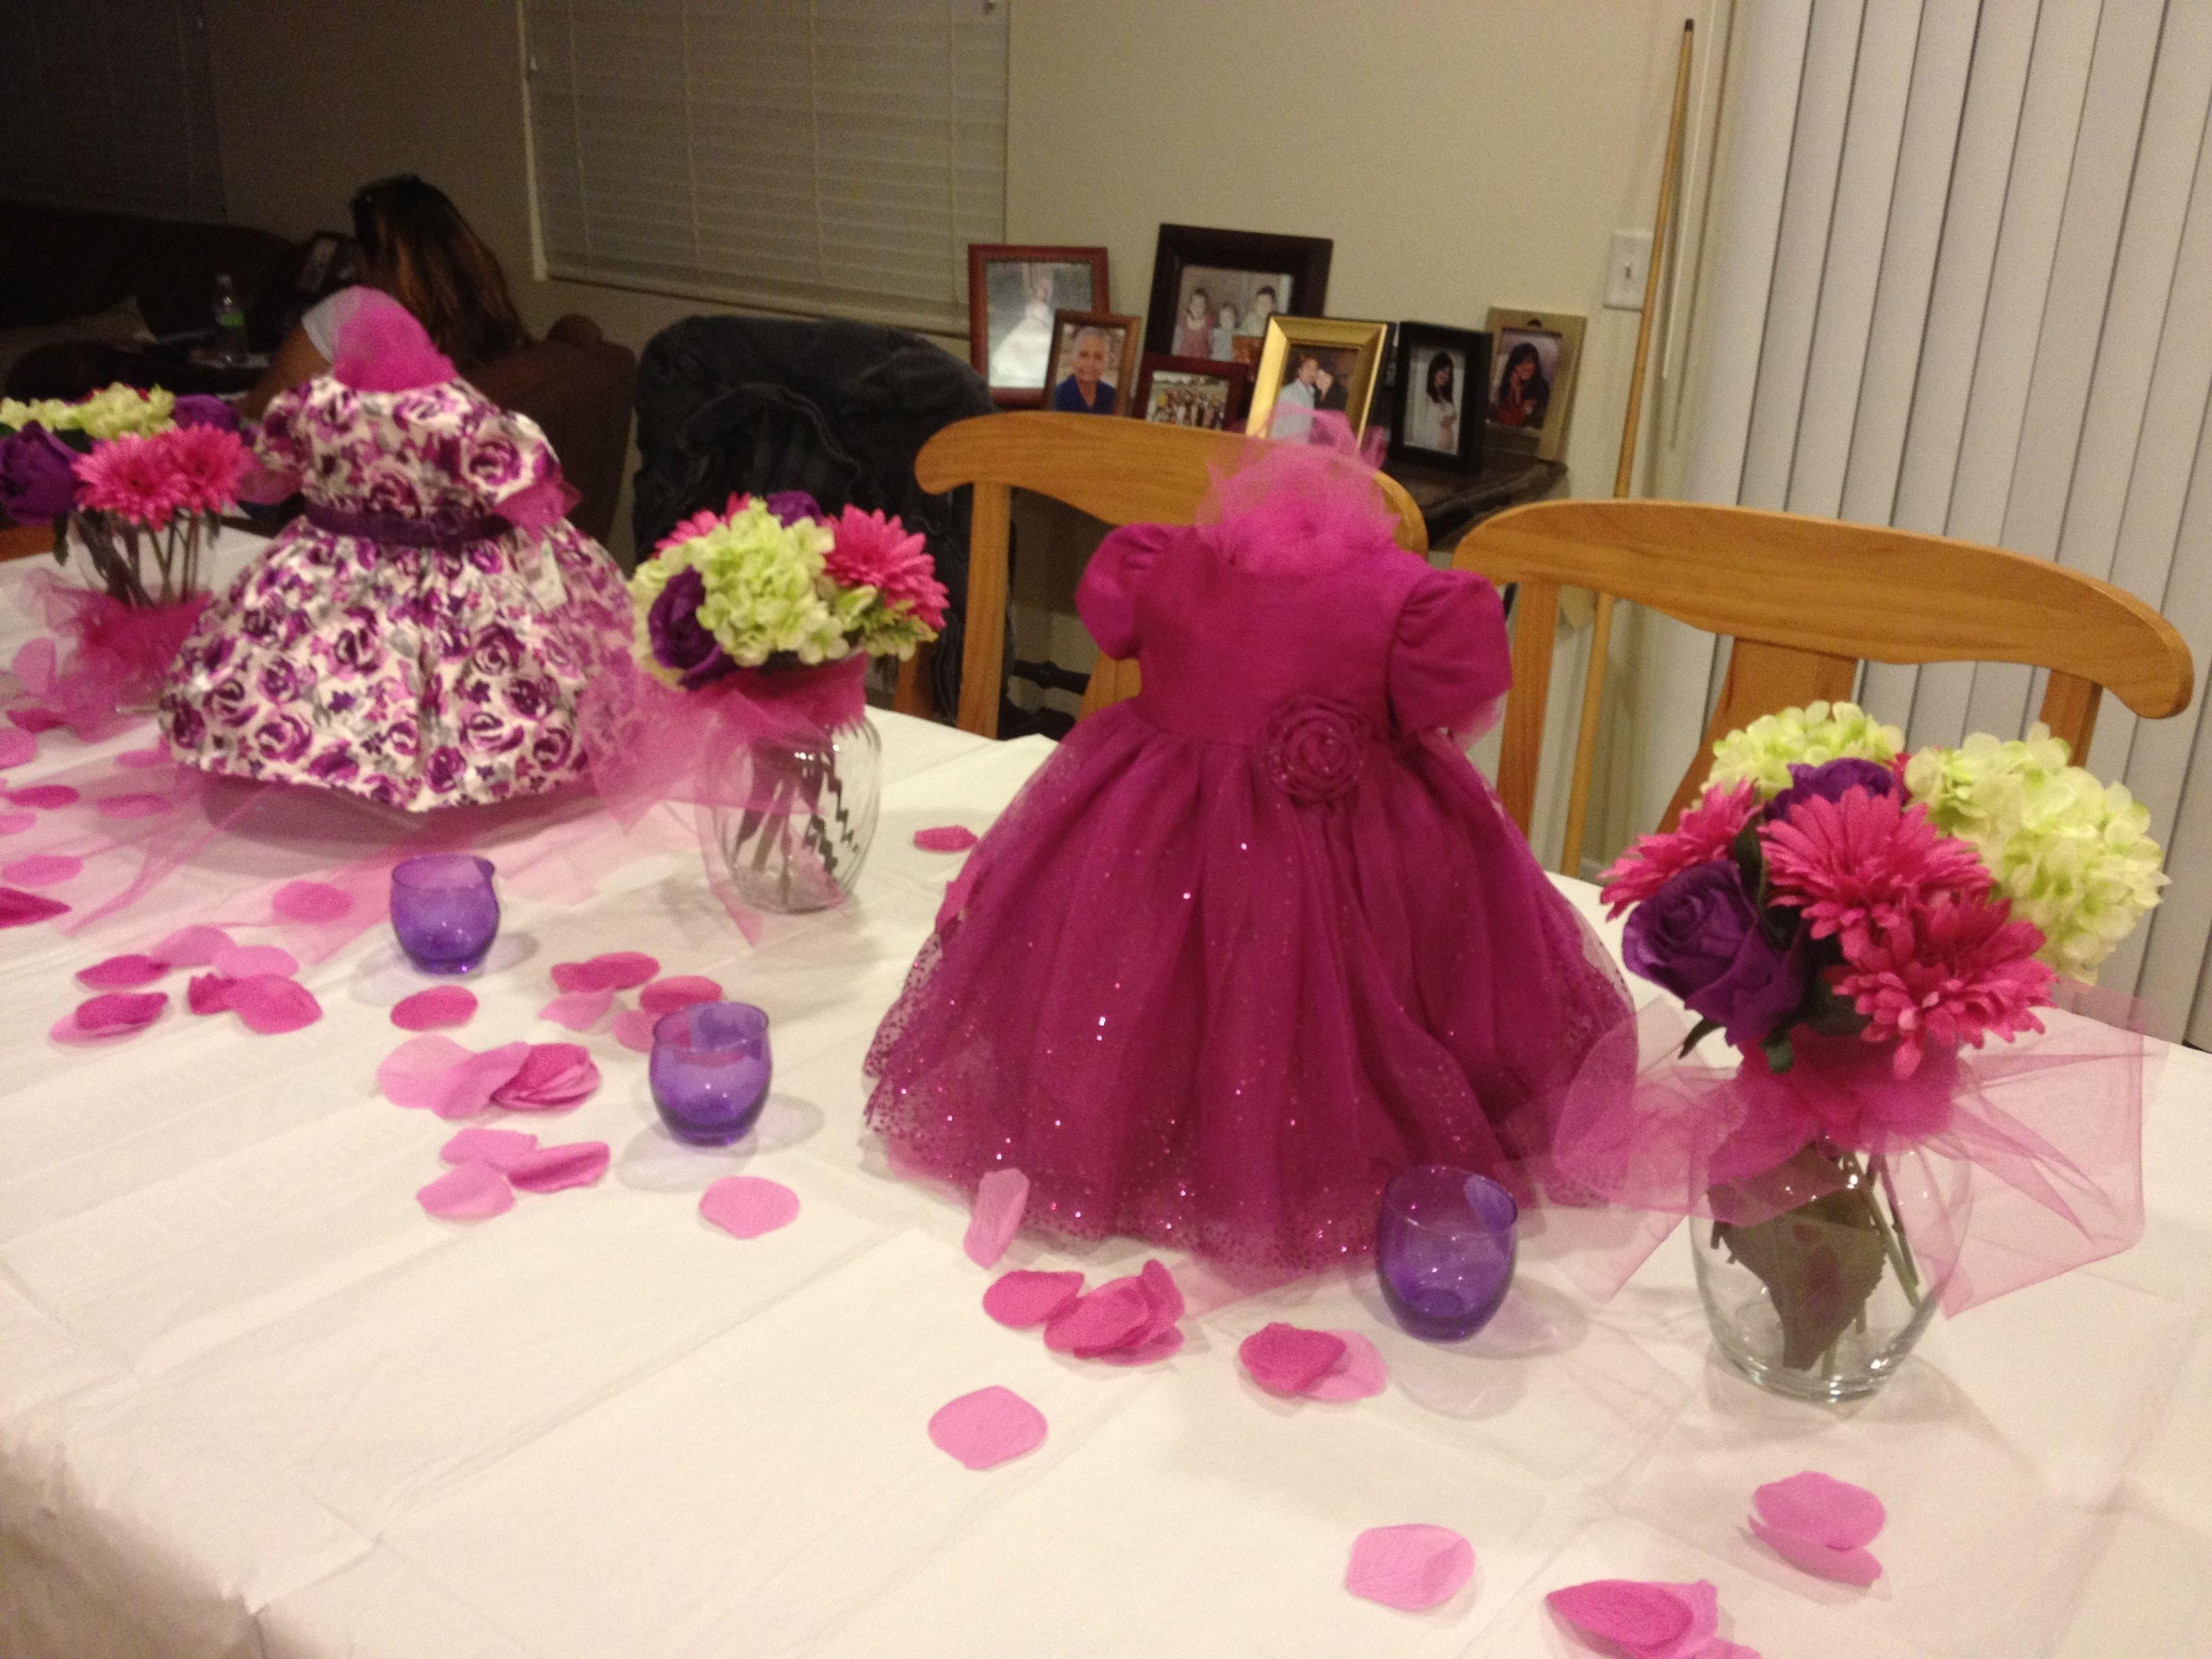 10 Fashionable Girl Baby Shower Centerpiece Ideas baby girl shower centerpieces pinks and purples pinterest 2020